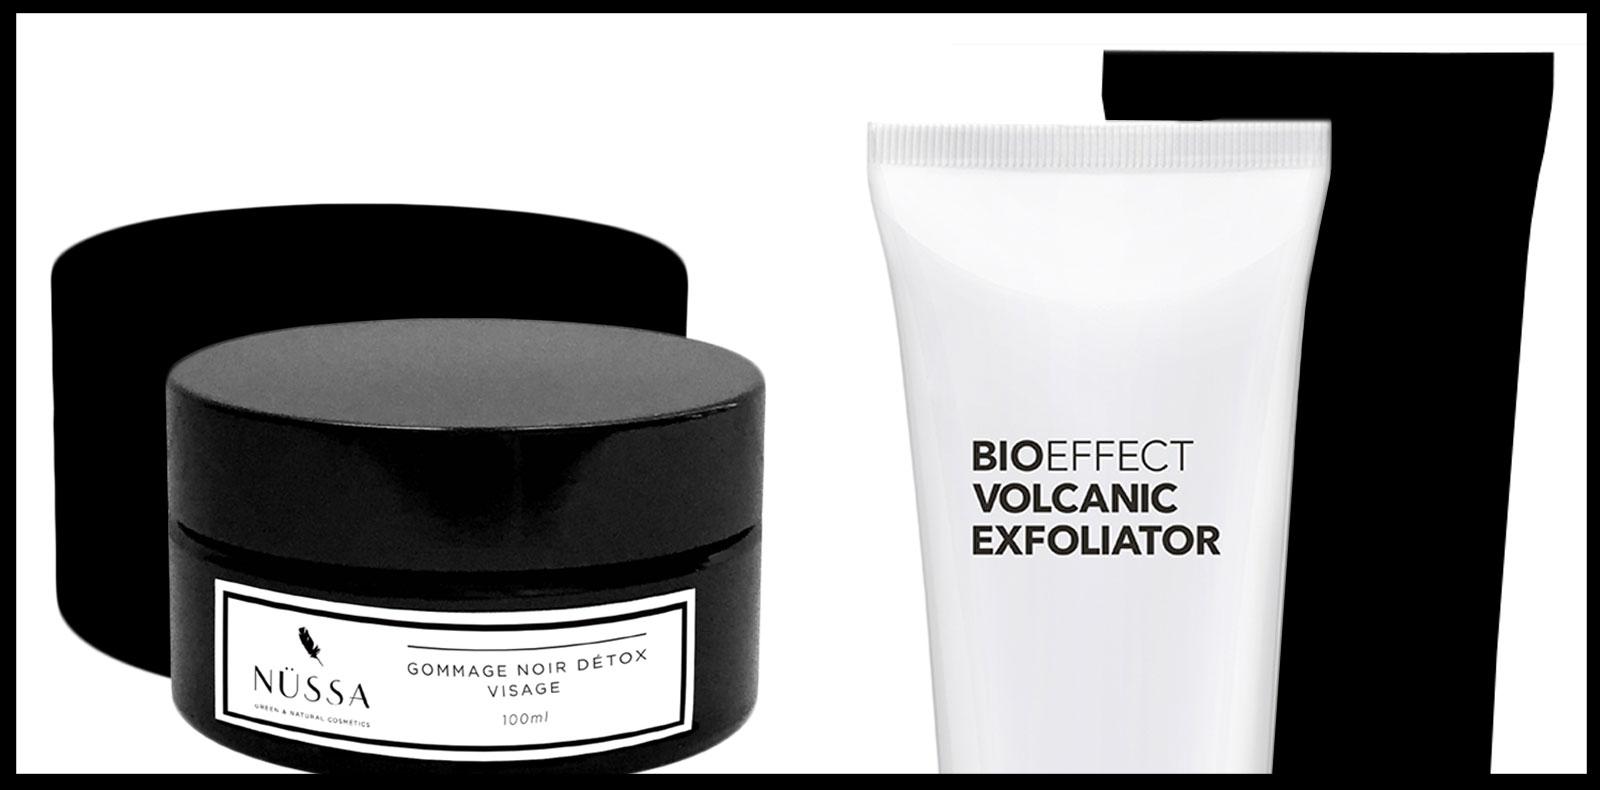 Exfoliants, volcanic formulas